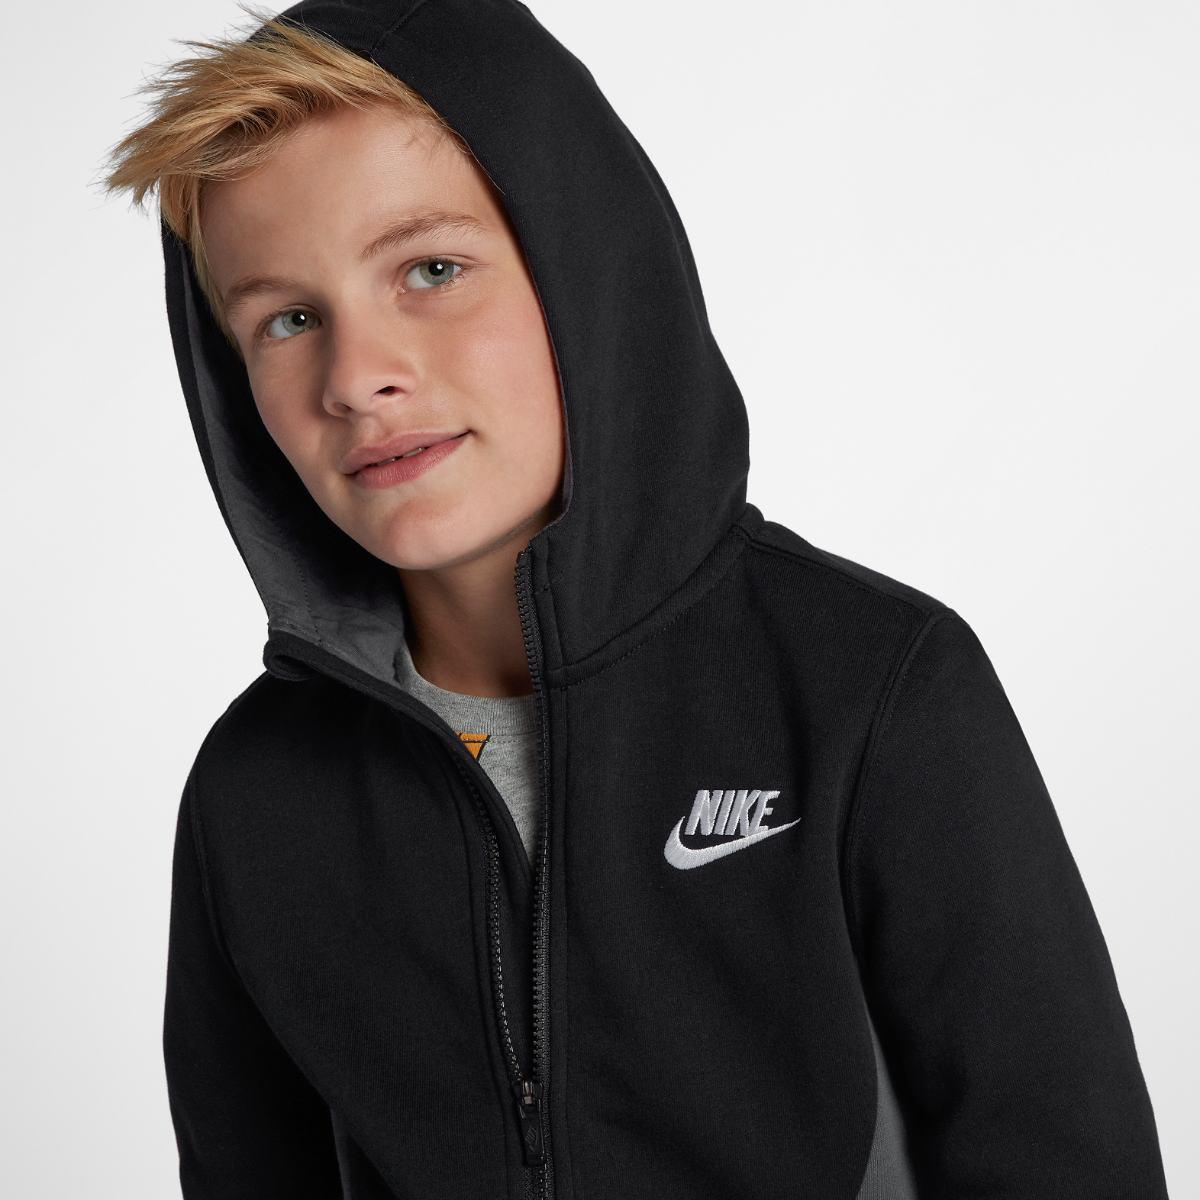 fe8596f94 Костюм Nike B NSW TRK SUIT BF CORE 939626-010 купить   deltasport.ua